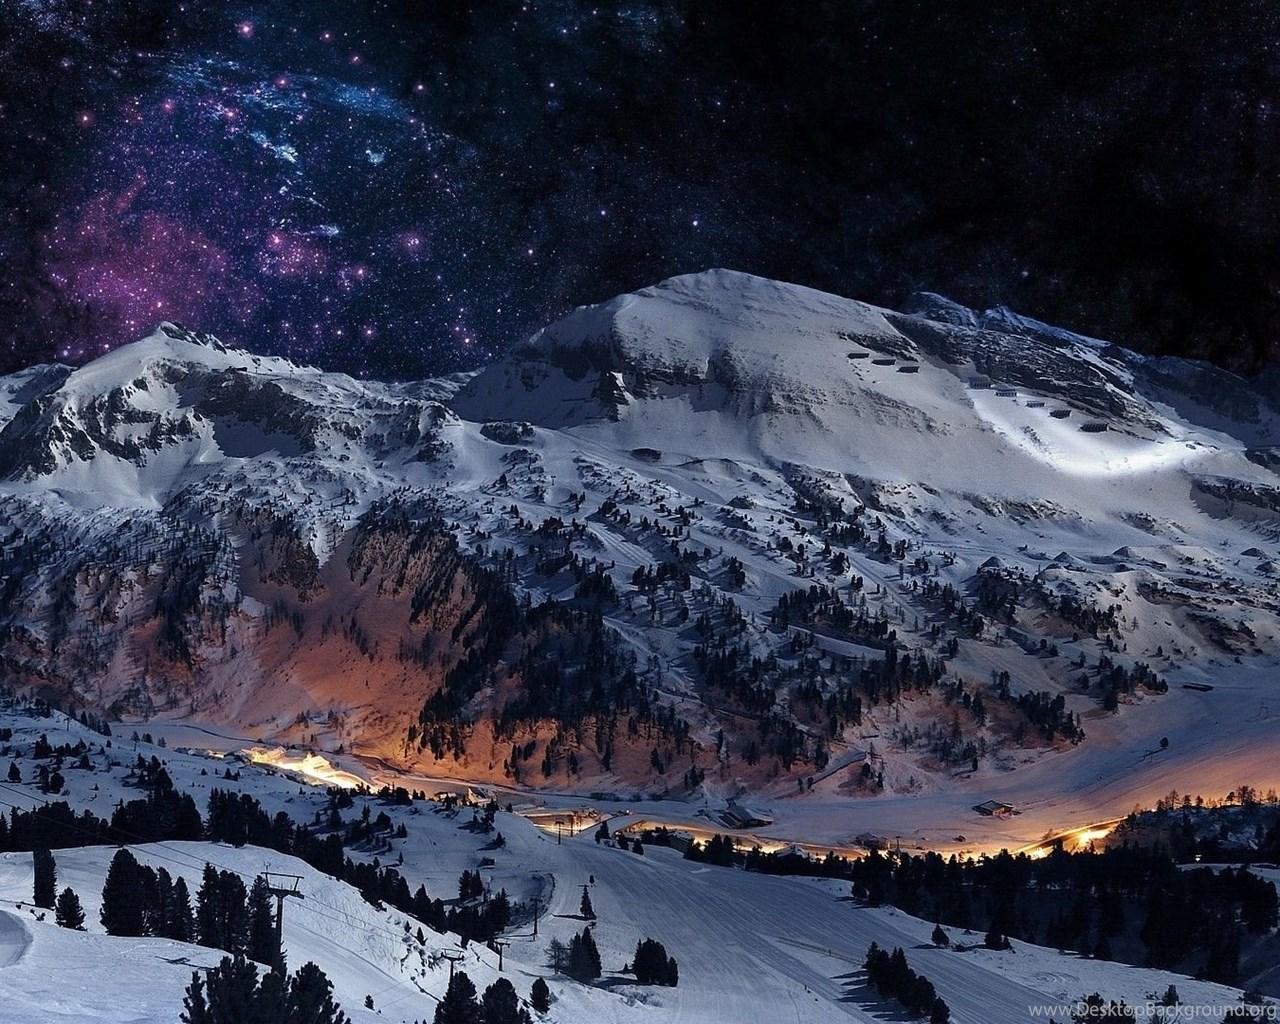 fonds d'écran ski : tous les wallpapers ski desktop background